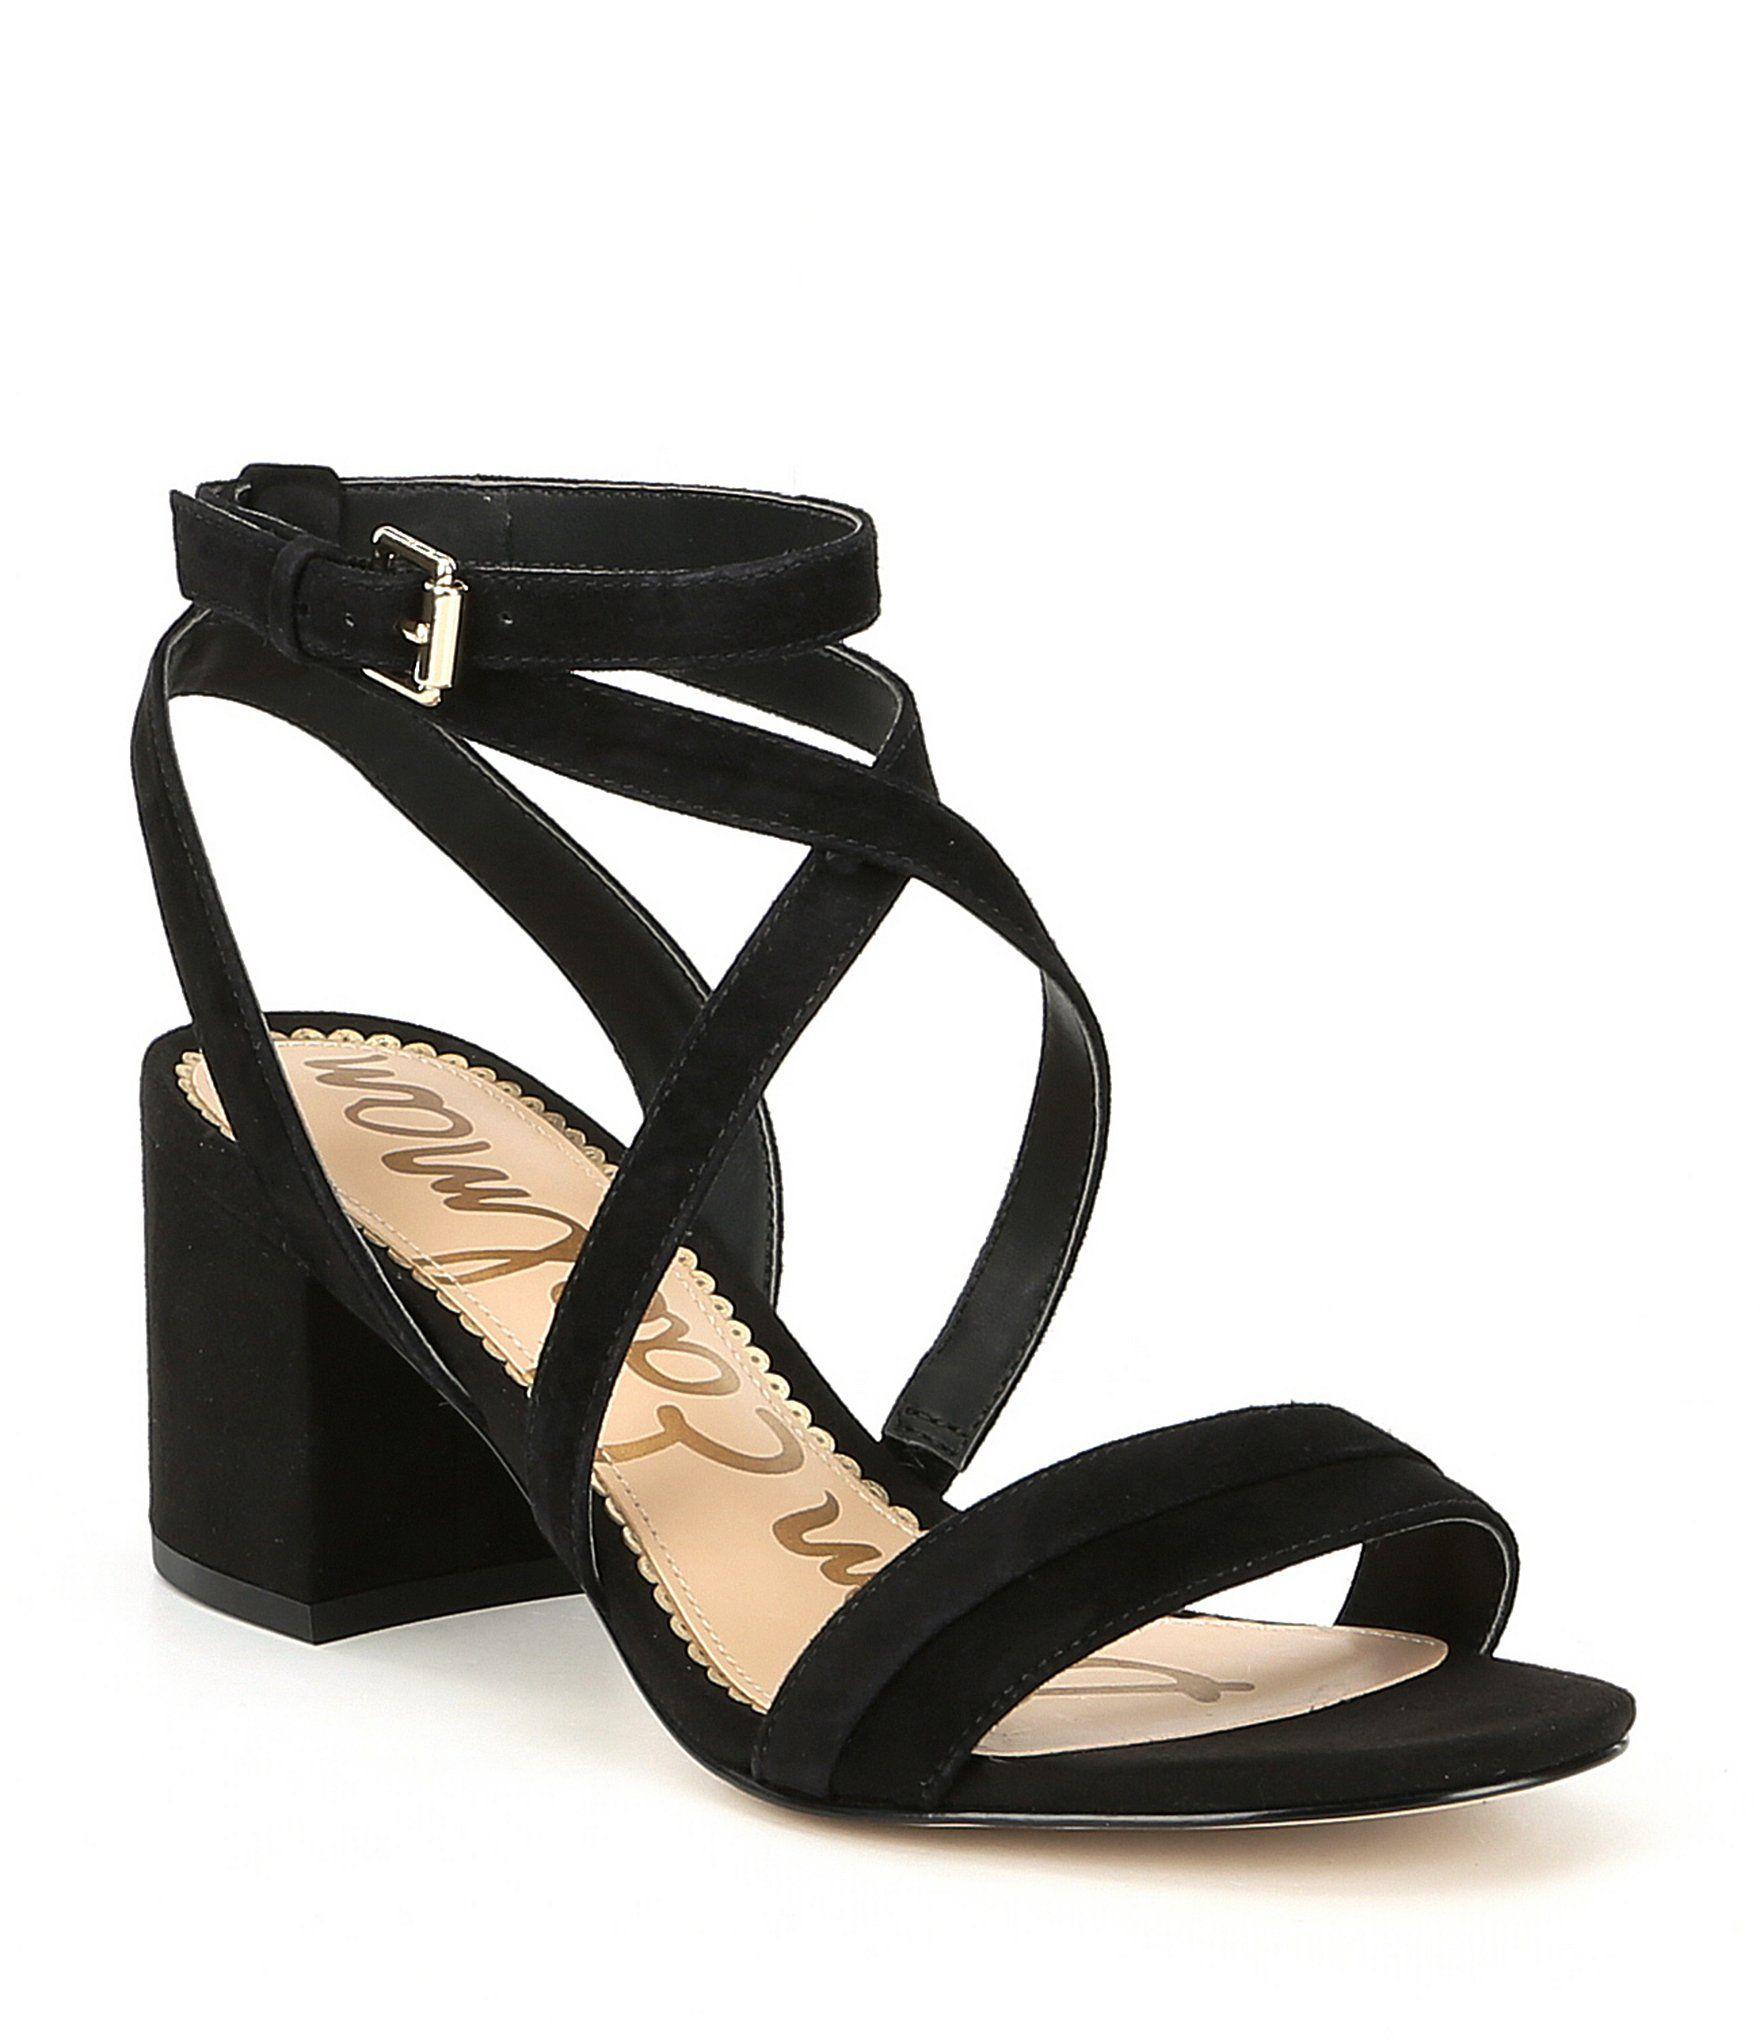 8fd45fdc214 Shop for Sam Edelman Sammy Suede Ankle Strap Block Heel Dress Sandals at  Dillards.com. Visit Dillards.com to find clothing